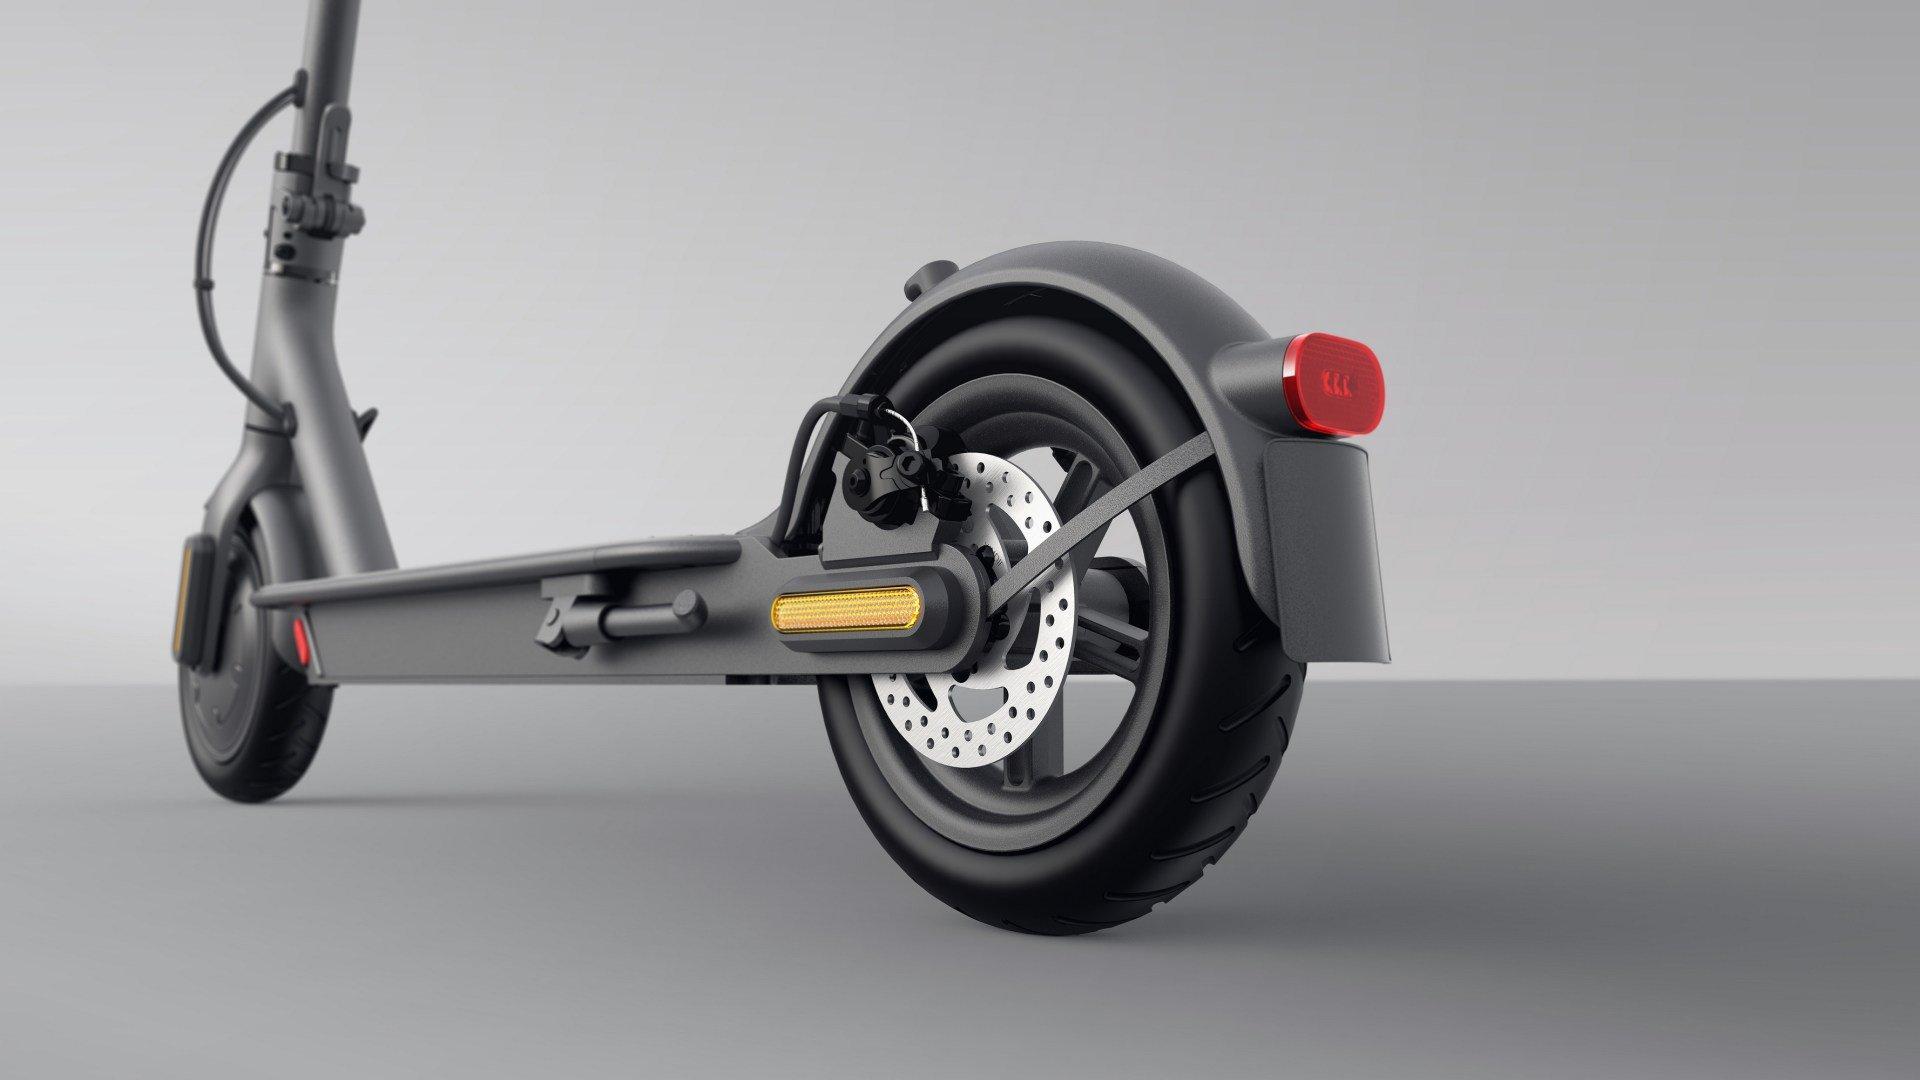 mi-scooter-1s-6.jpg